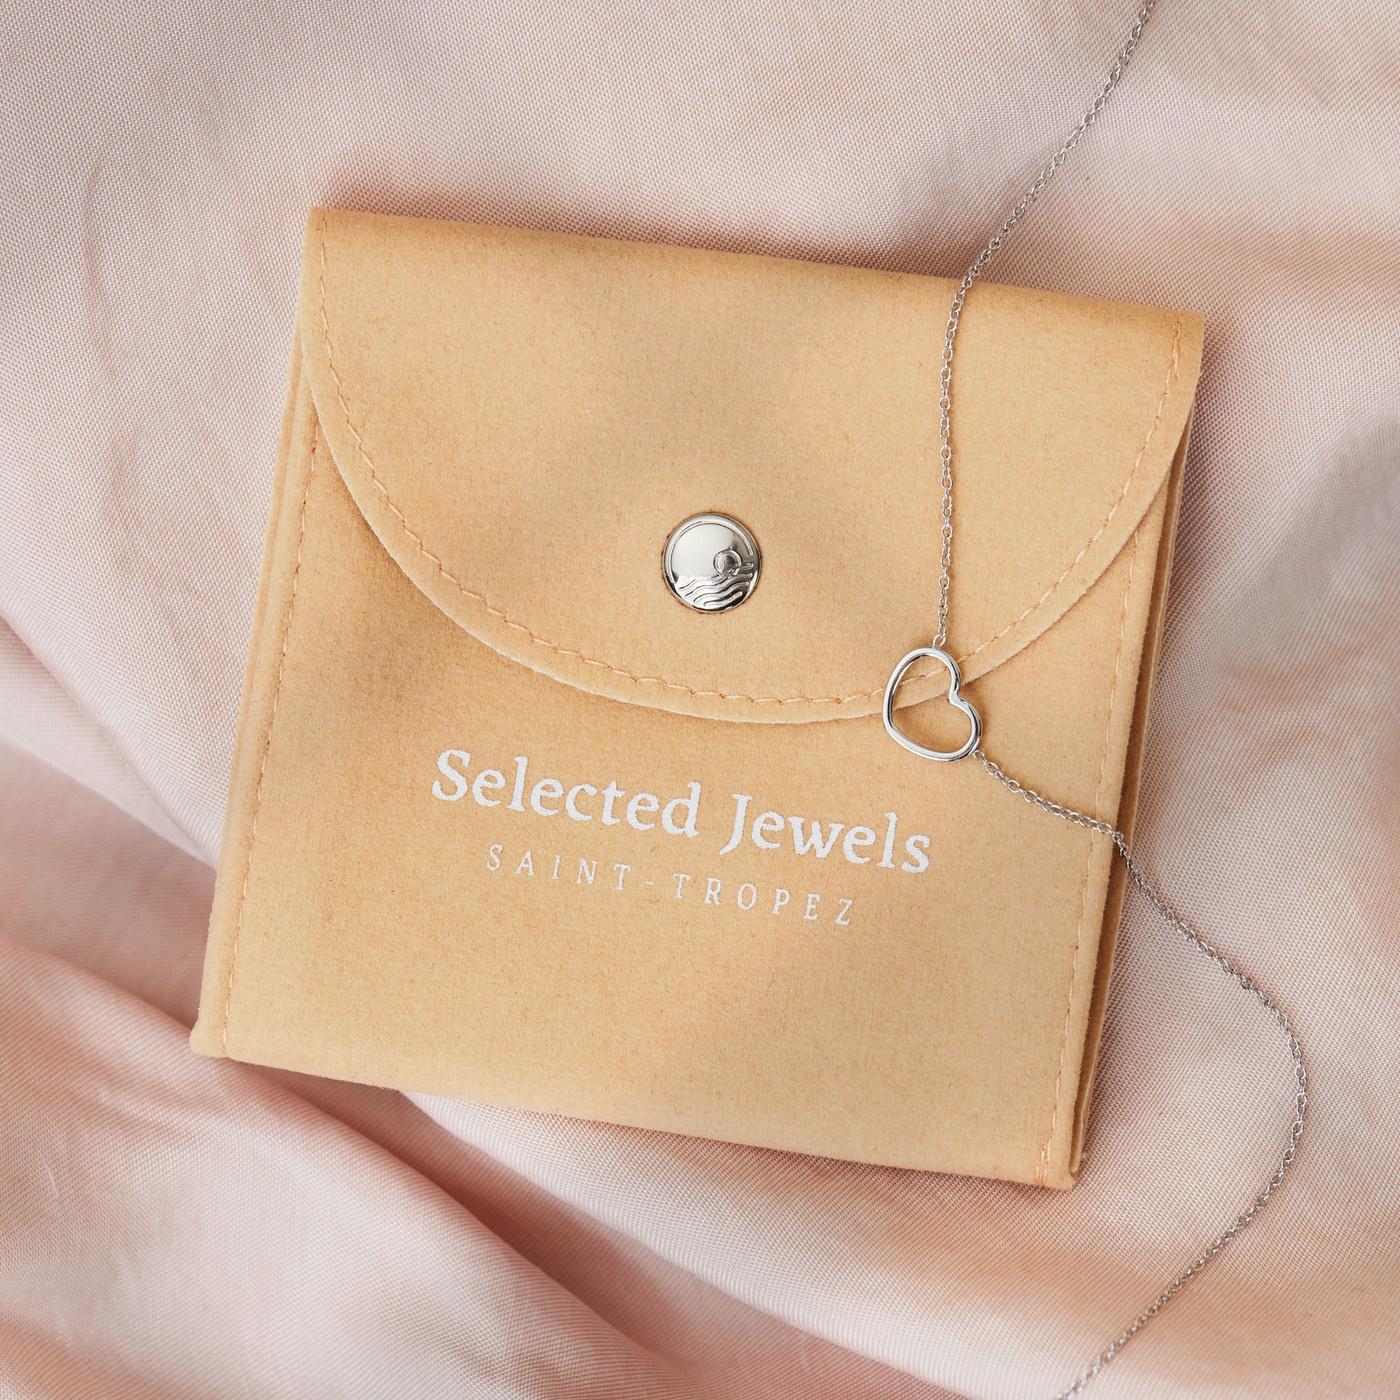 Selected Jewels Mila Elodie örhängen i 925 sterling silver